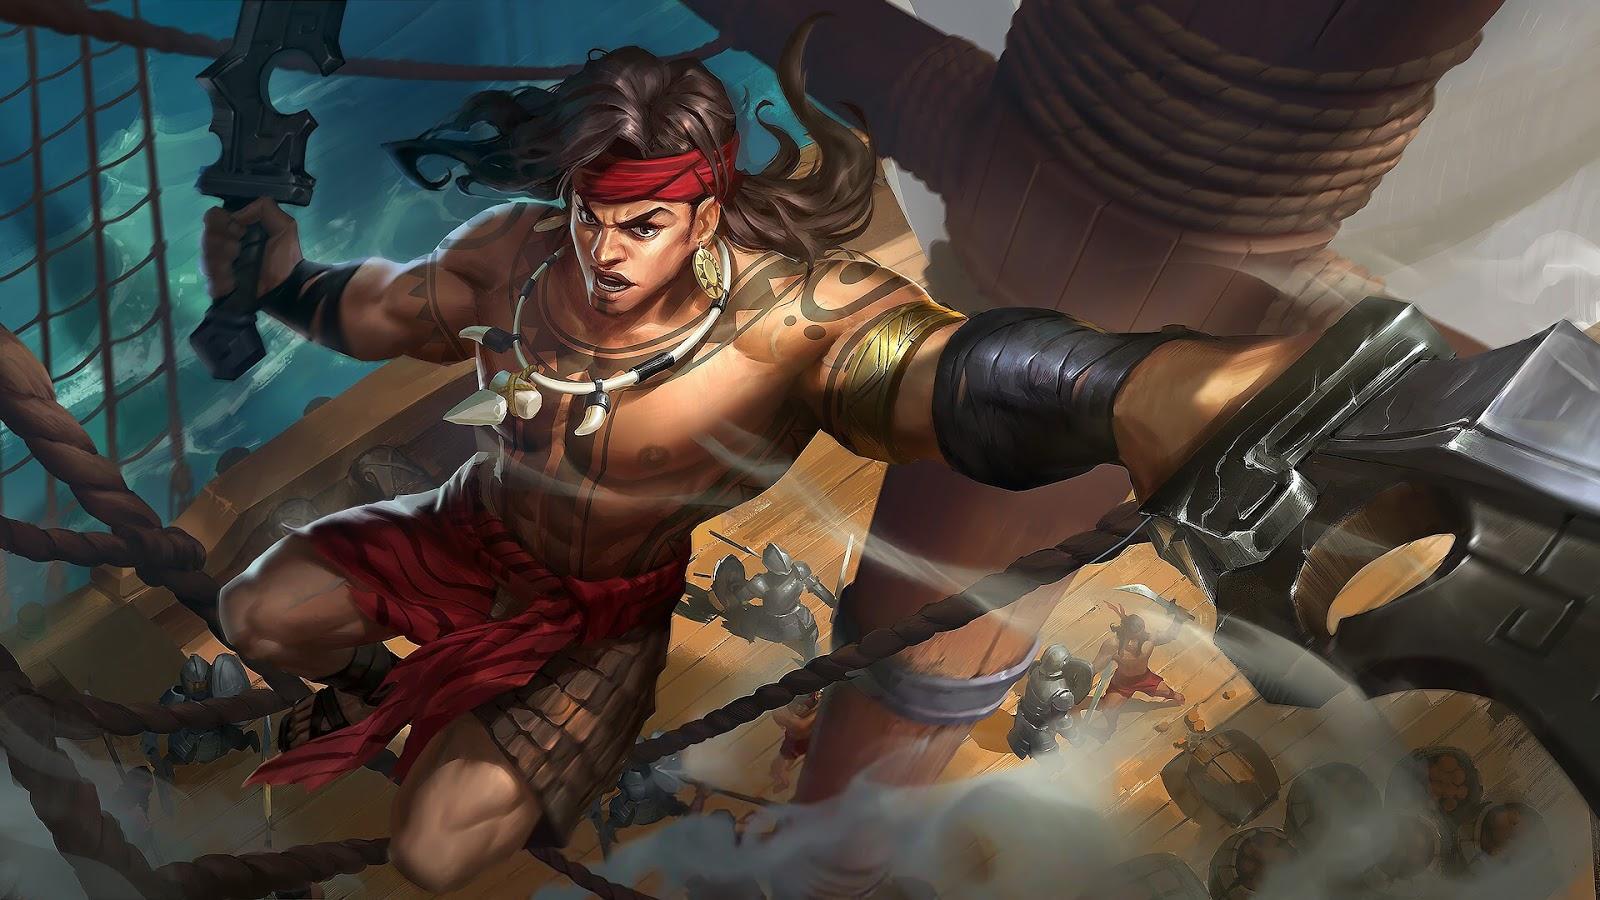 Wallpaper Lapu-Lapu Great Chief Skin Mobile Legends HD for PC